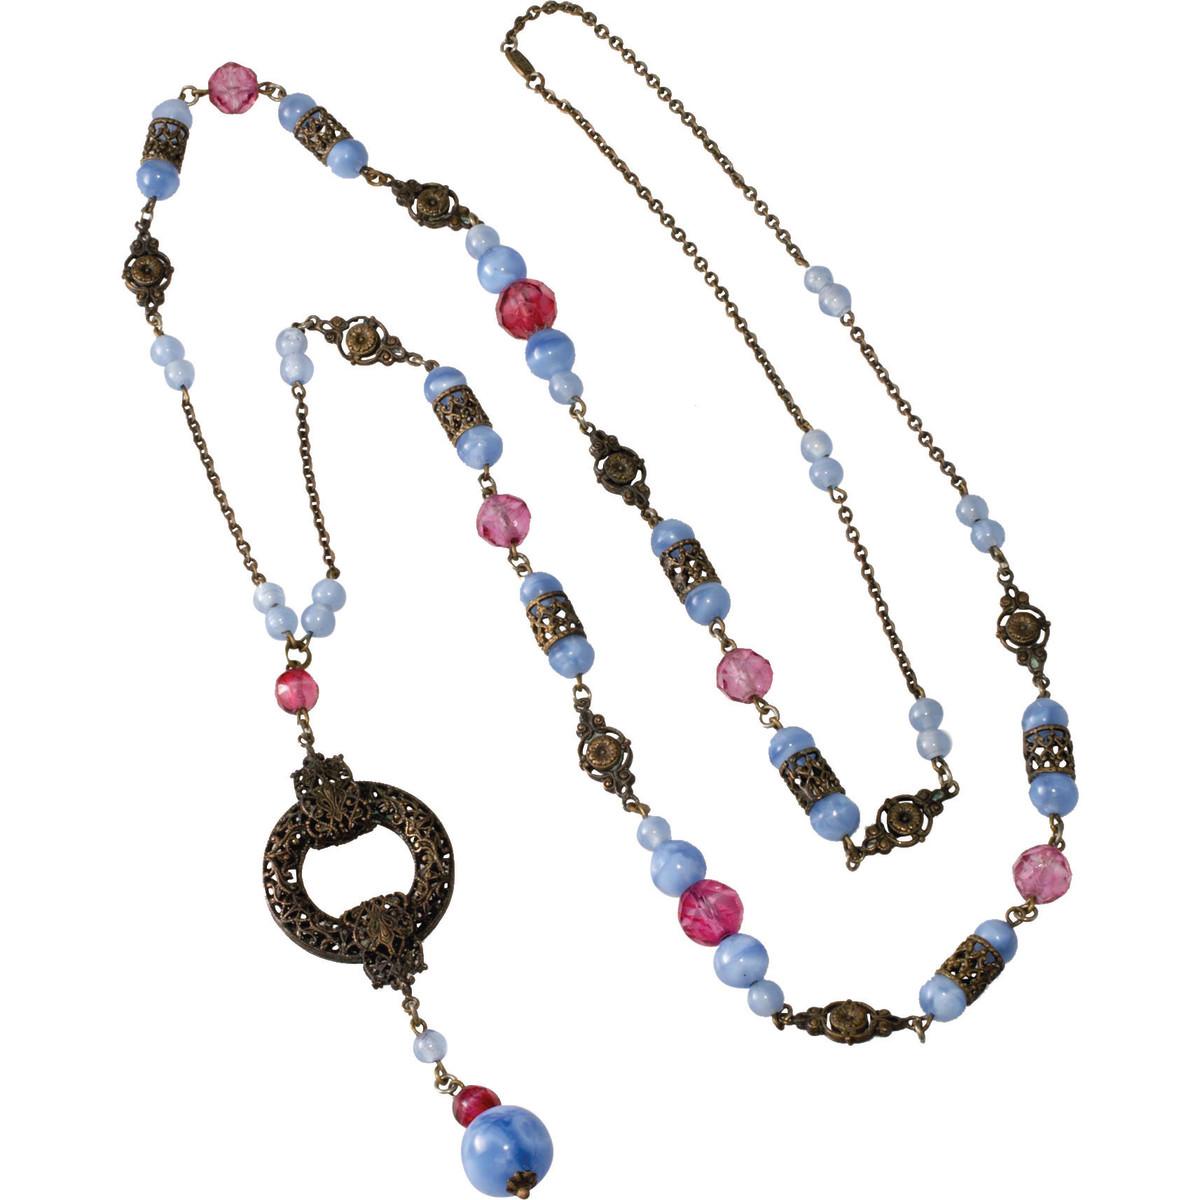 Bliss sautoir necklace, 1919-1920.